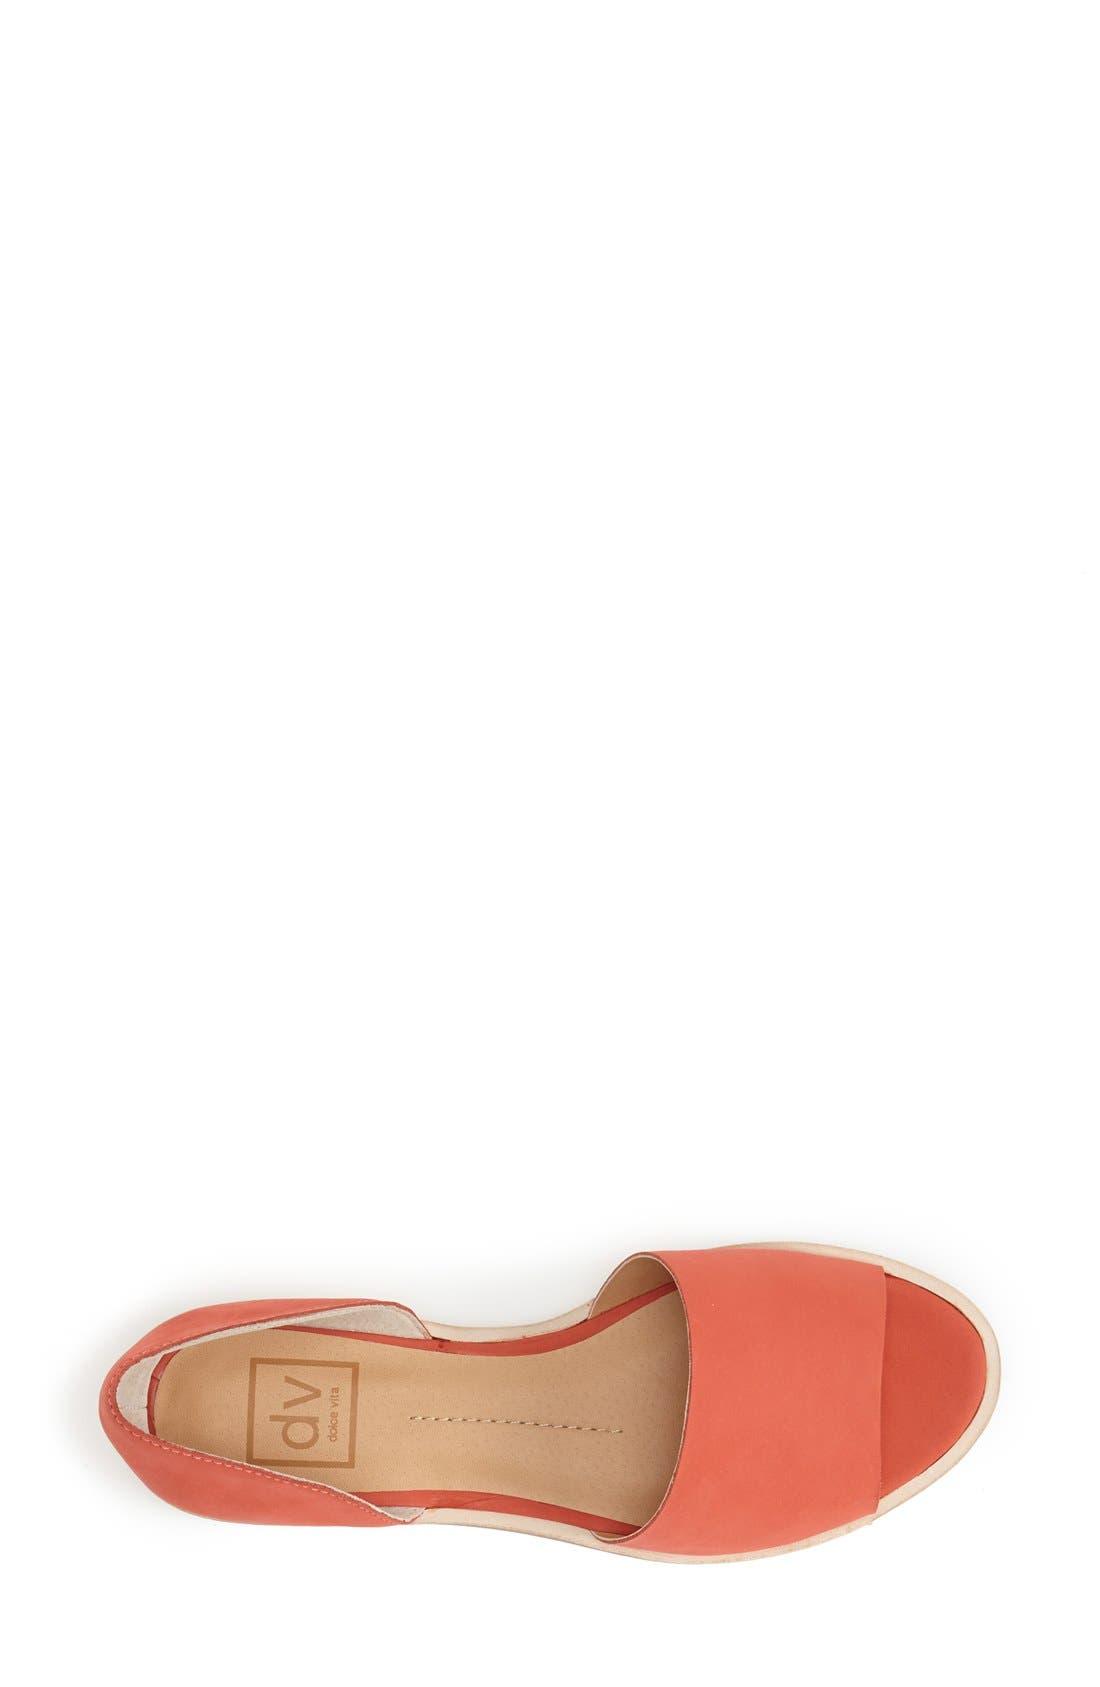 Alternate Image 3  - DV by Dolce Vita 'Datsun' Leather Sandal (Women)